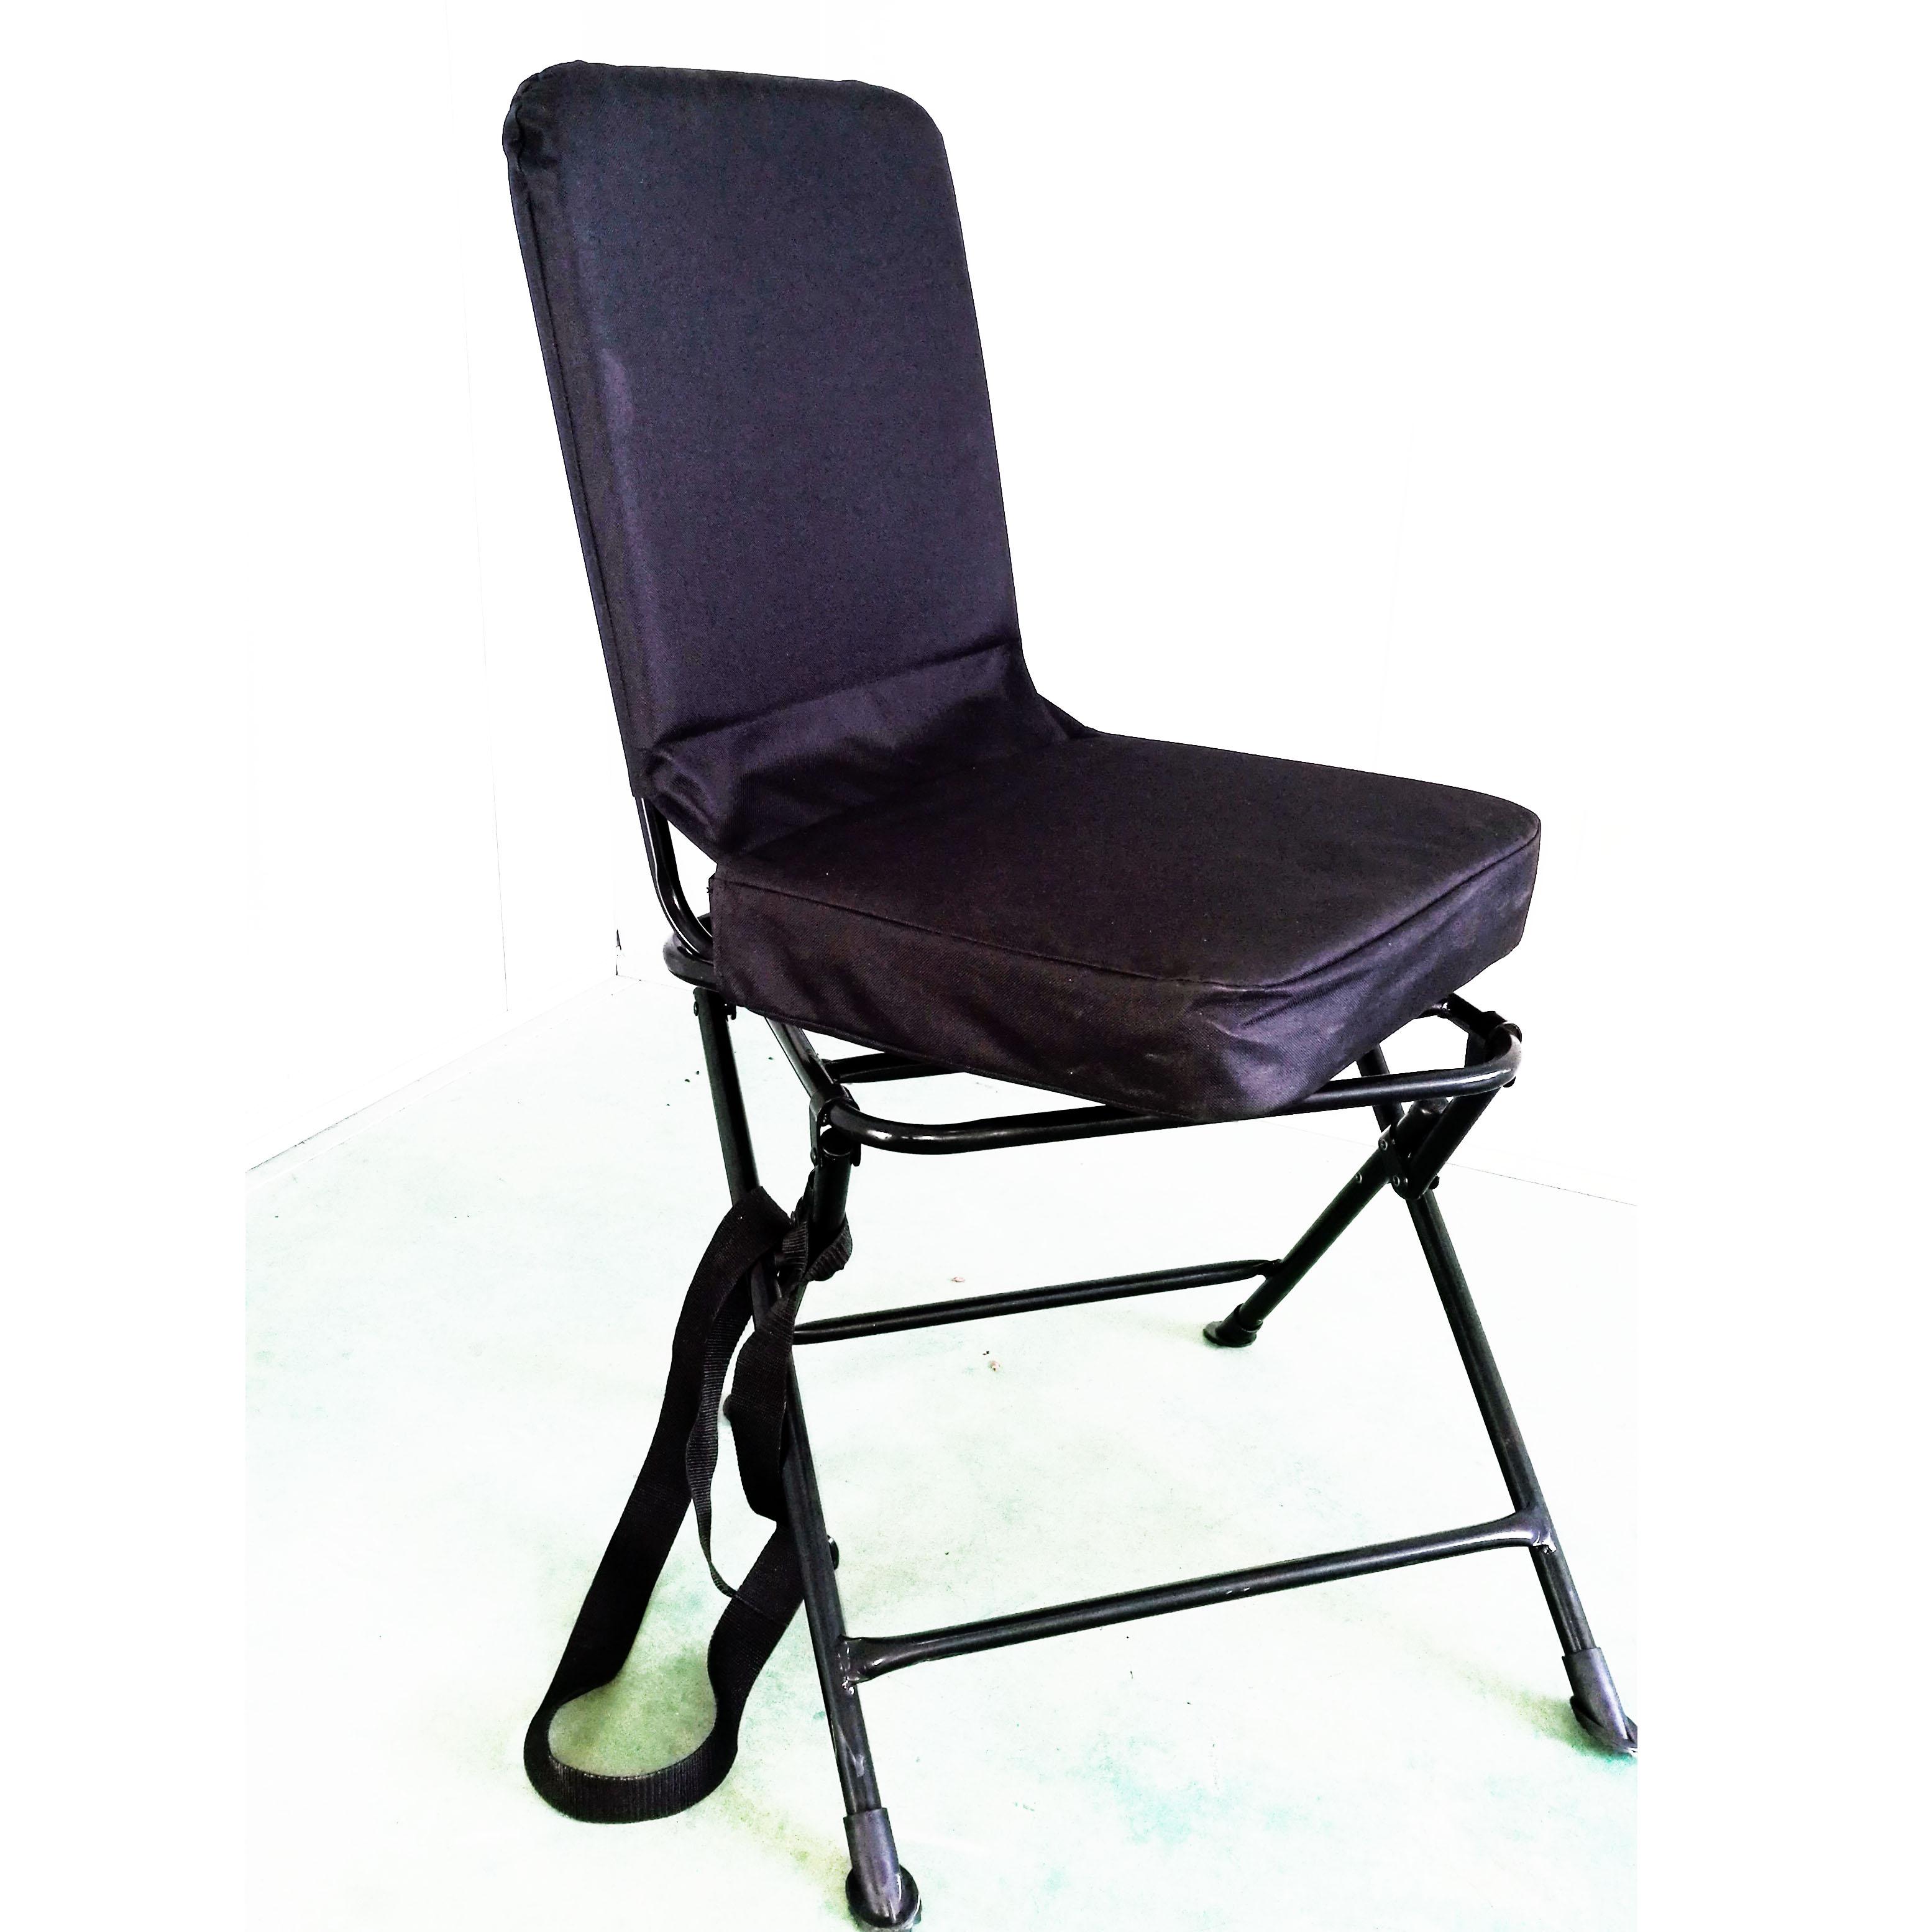 Big Boy Portable Hunting 360 Swivel Chair  sc 1 st  Alibaba & Big Boy Portable Hunting 360 Swivel Chair - Buy Hunting Chair ...